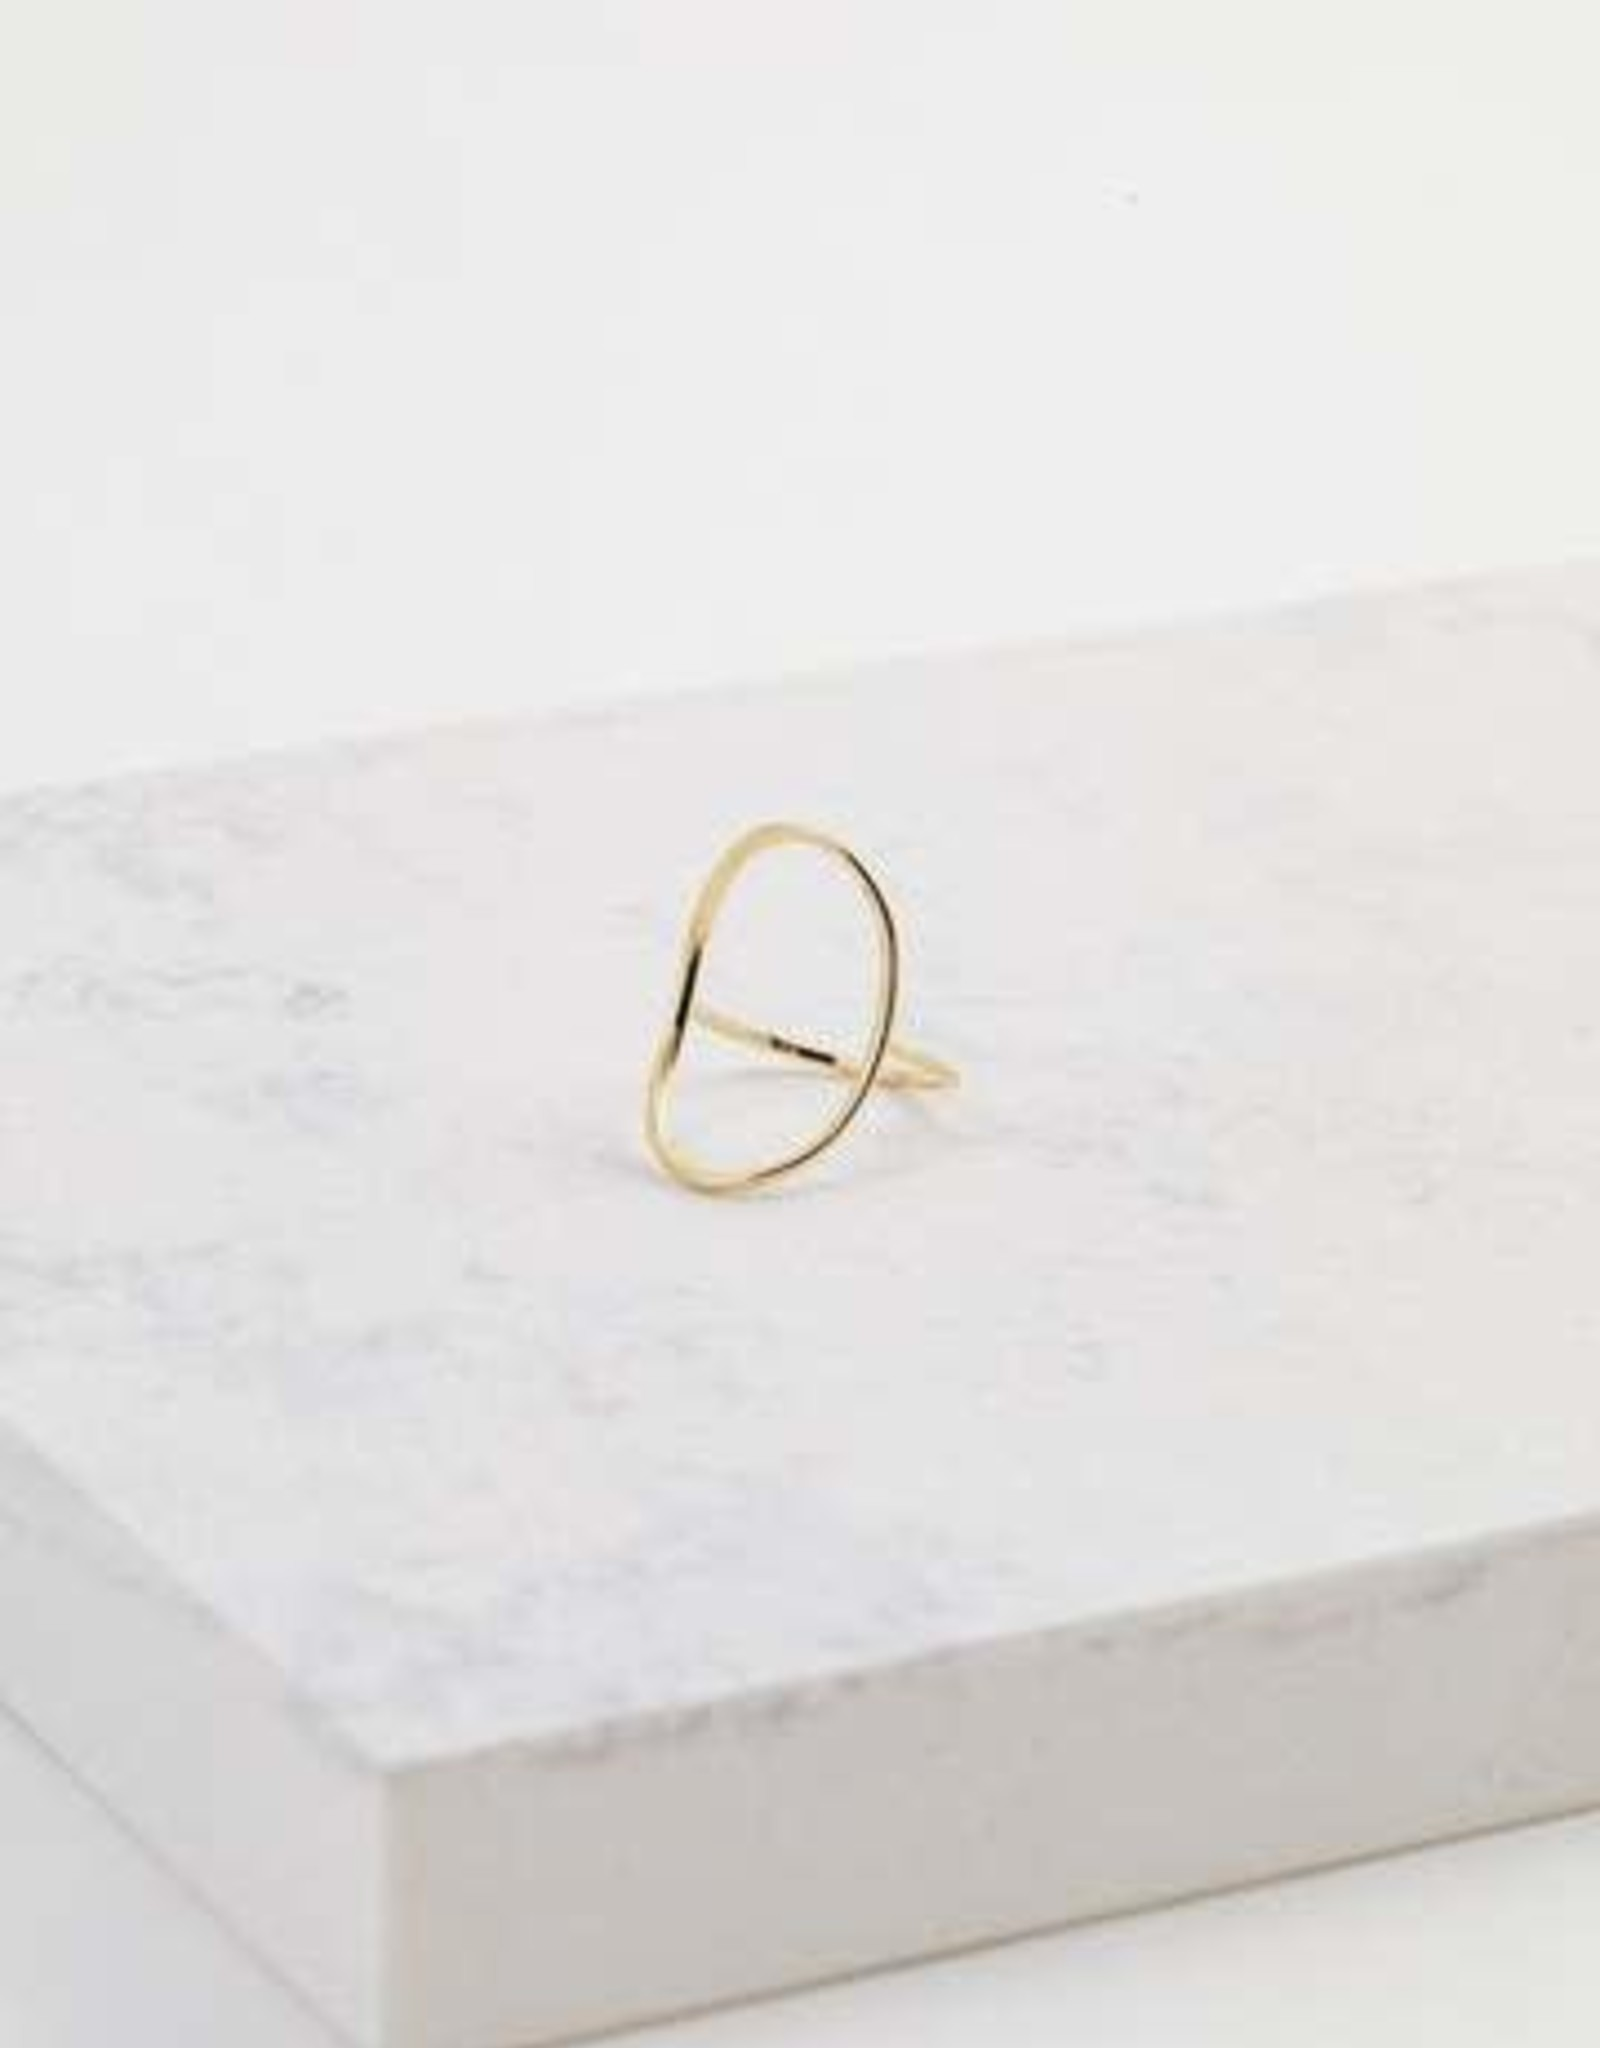 Gold Plated Brass Origin Ring